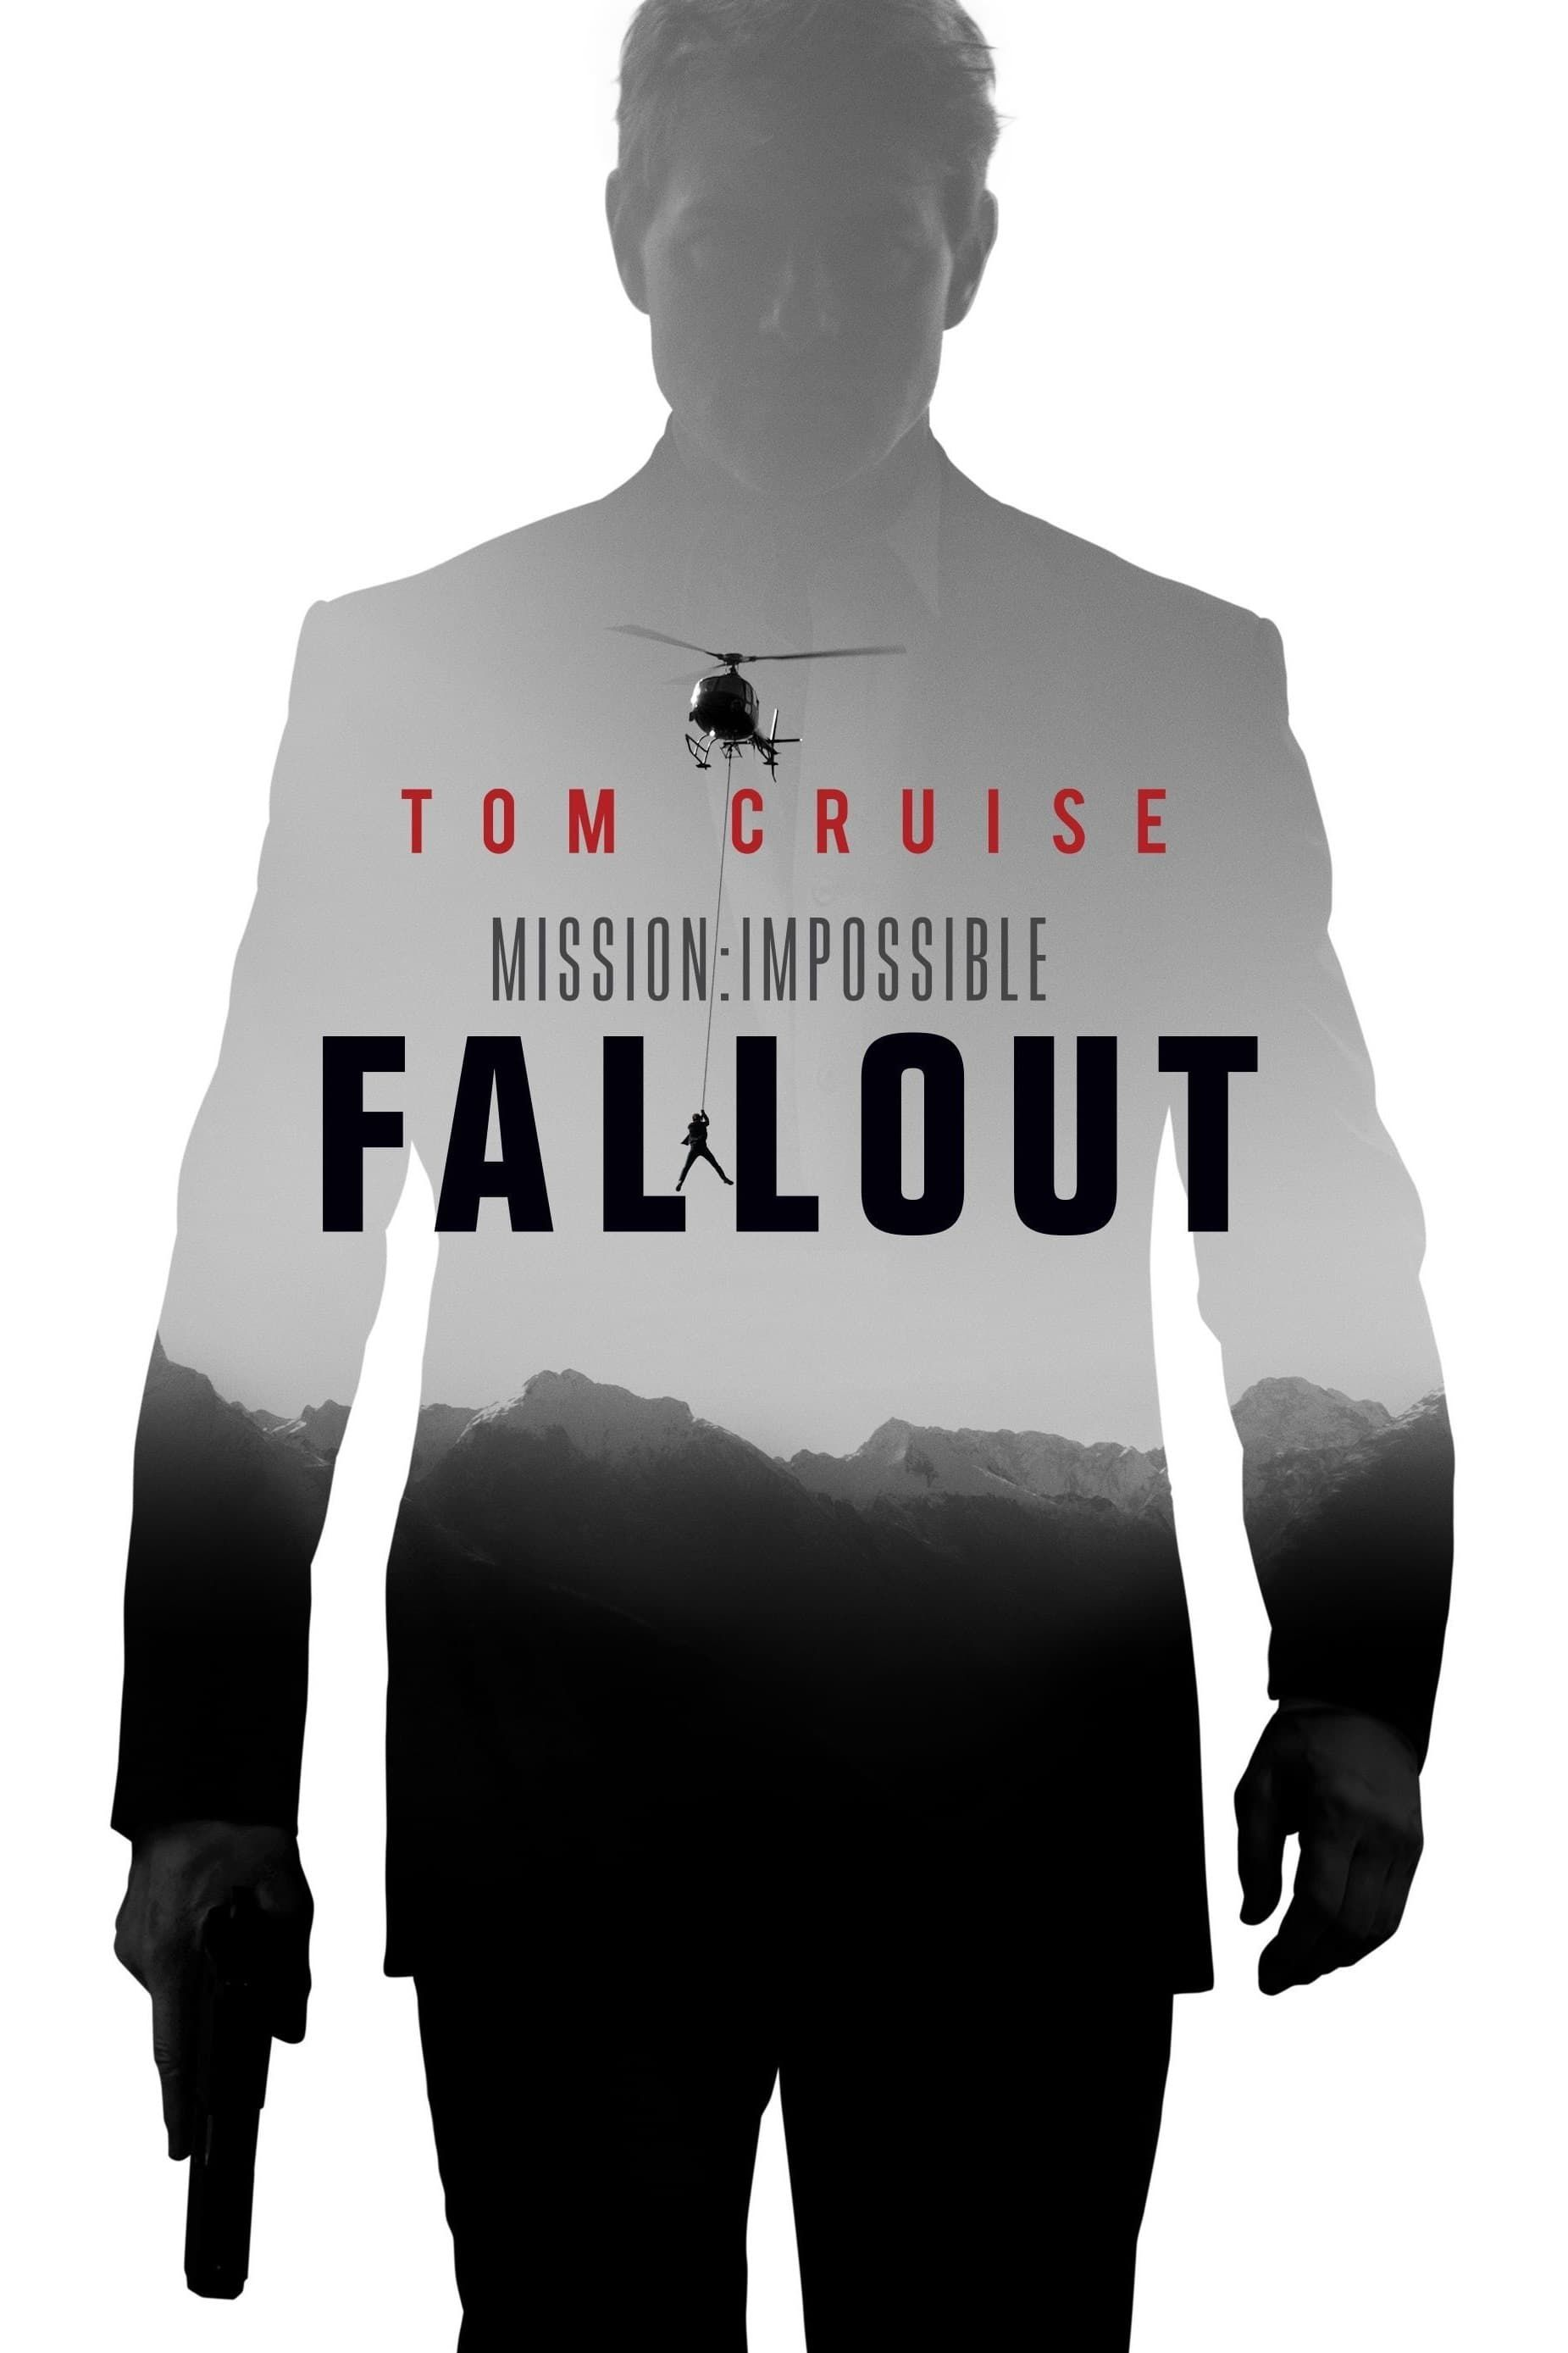 Ver Hd Mision Imposible 6 Fallout Espanol Latino Full Hd 1080p Ultrapeliculashd Fallout Peliculas Completas Mision Imposible